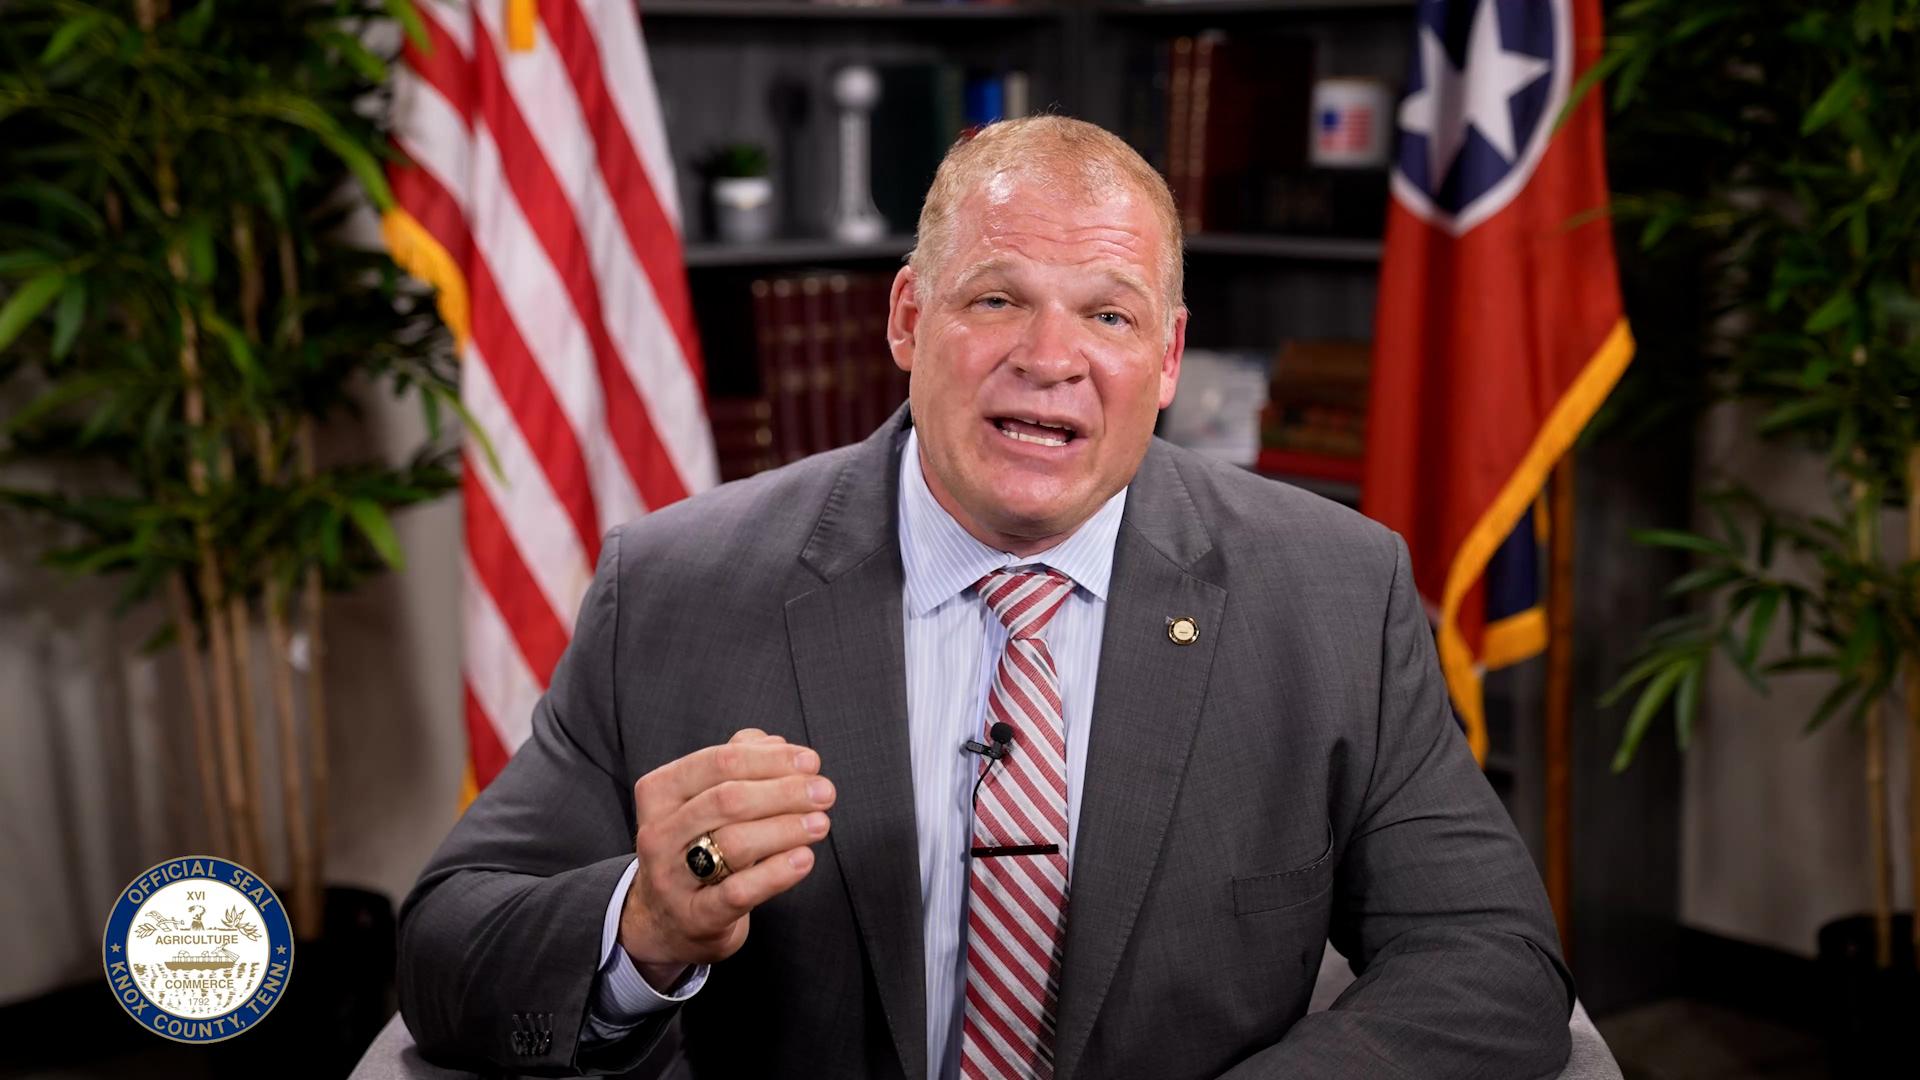 Knox County Mayor Speaks Out Against School Mask Mandates